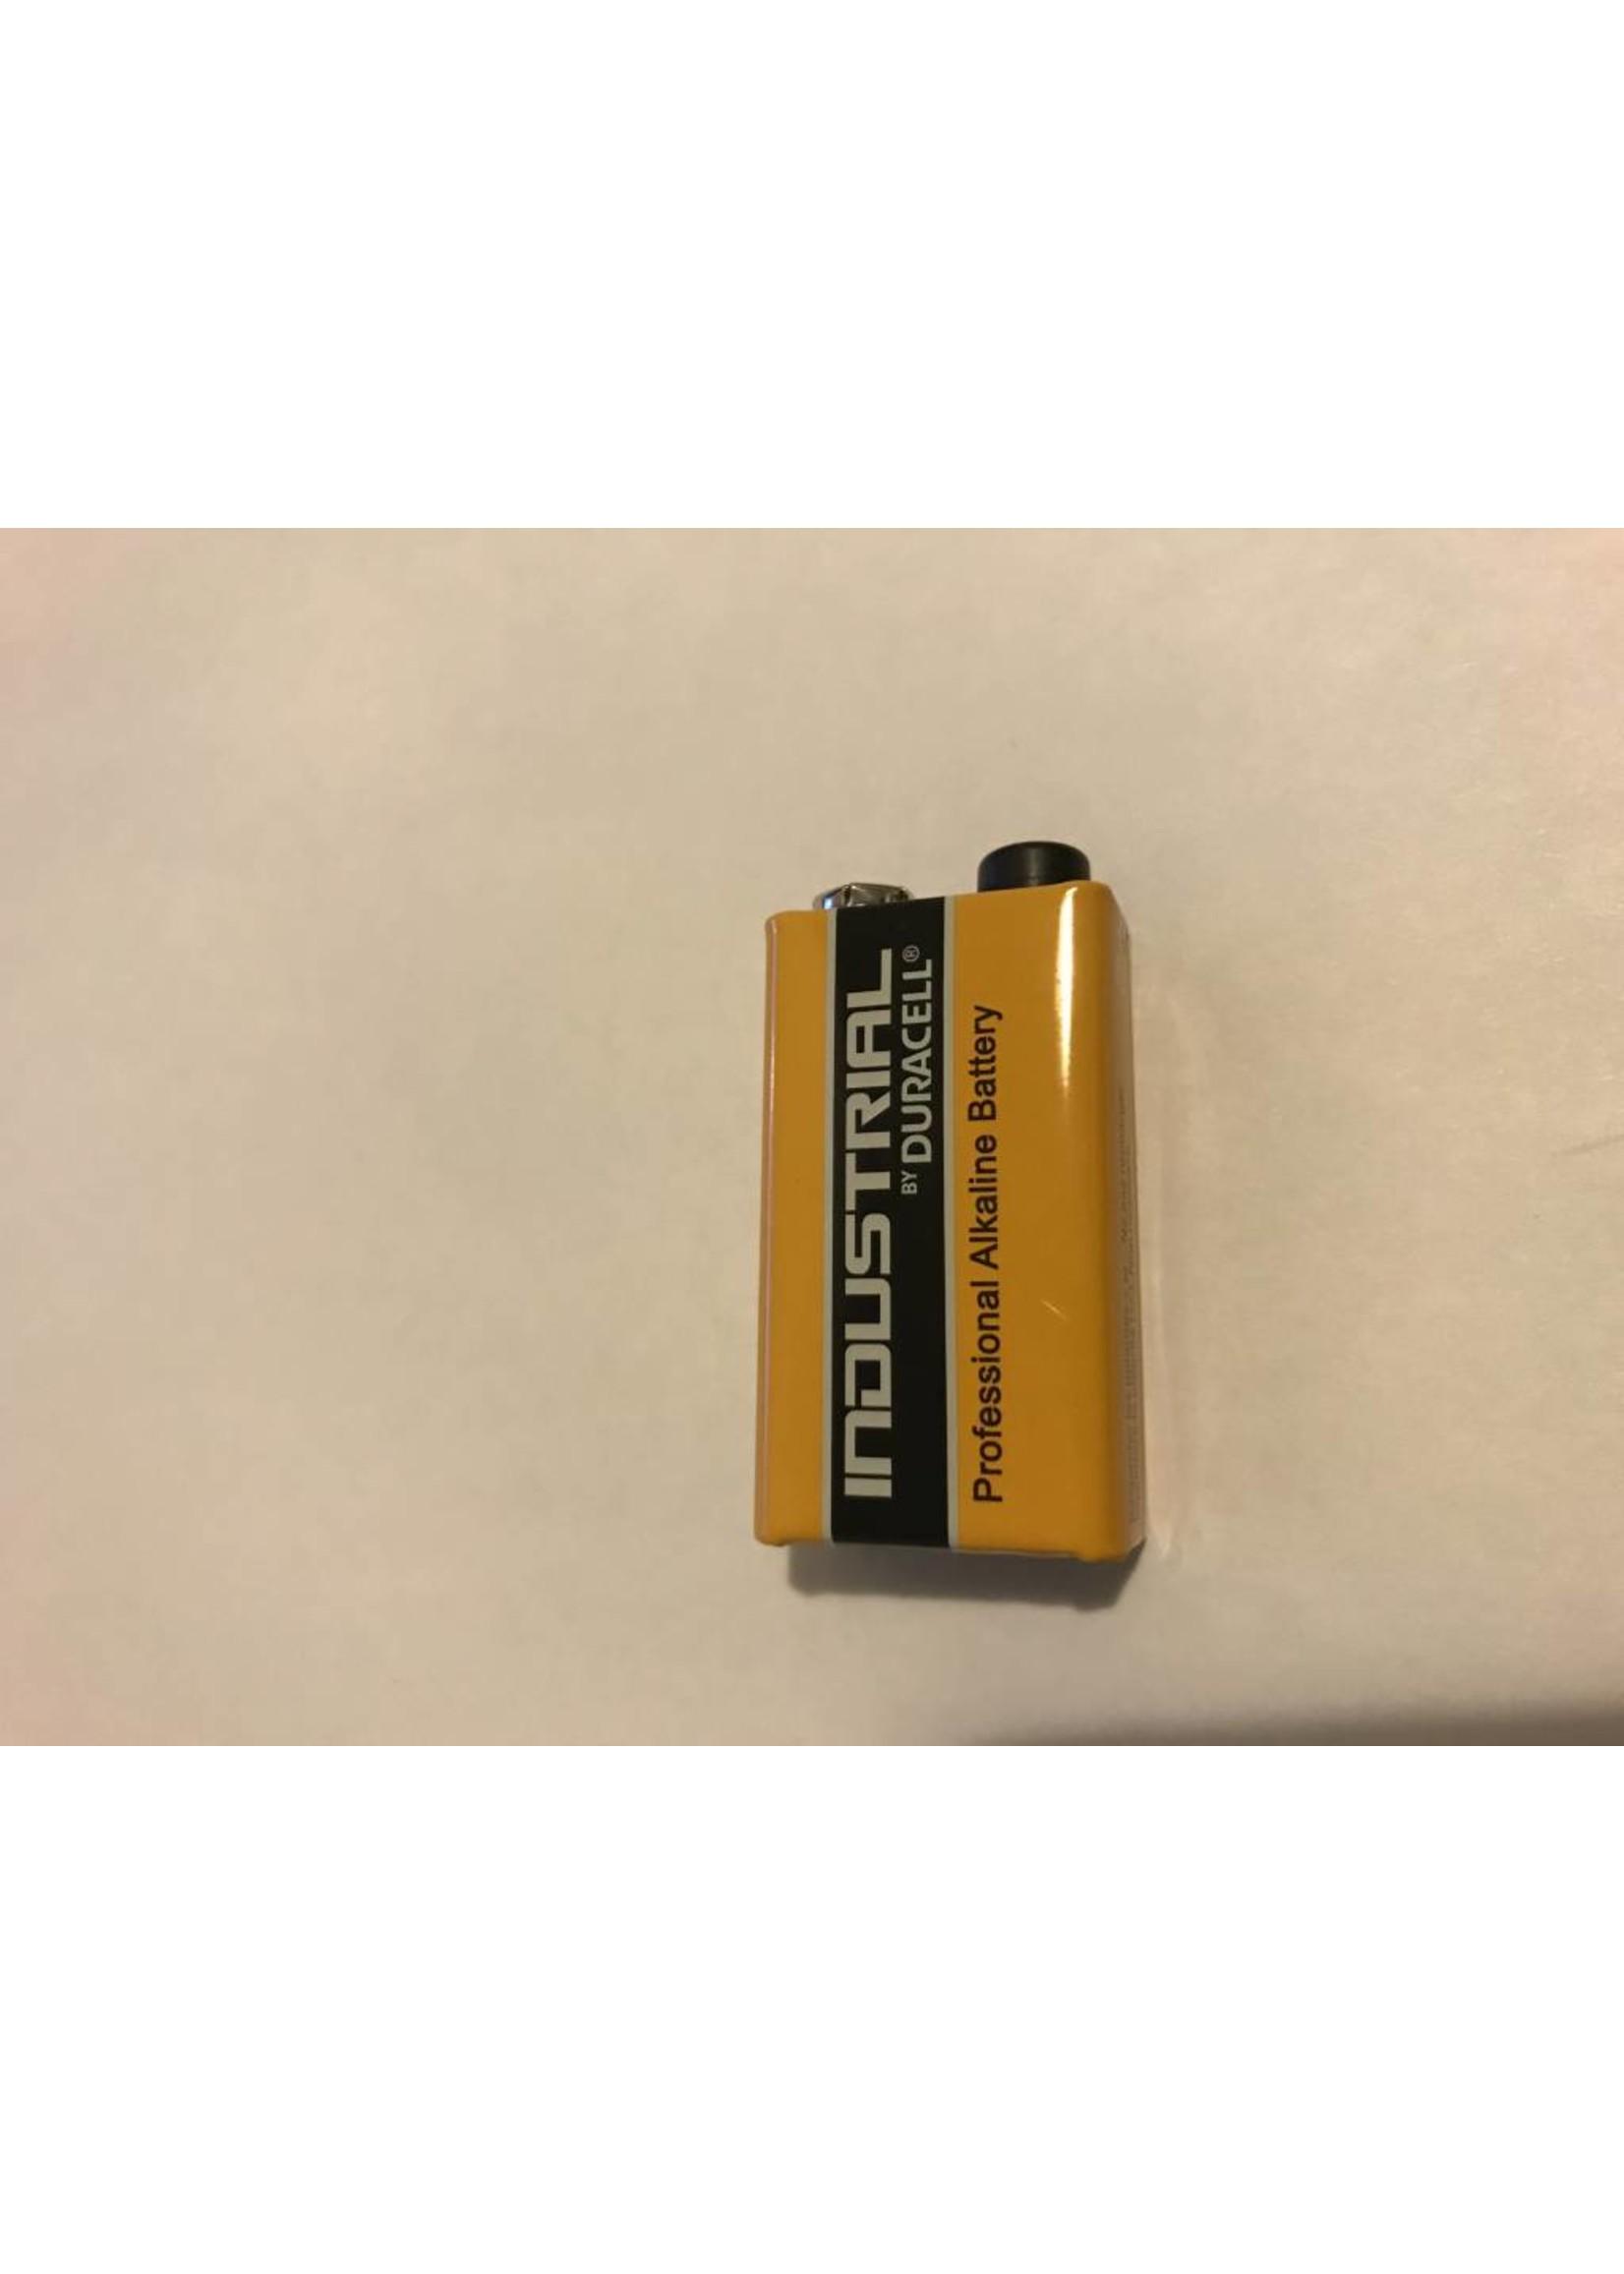 Duracell blok 9V -AA-AAA-pinlights-LR06/stilo/mignon/1,5V